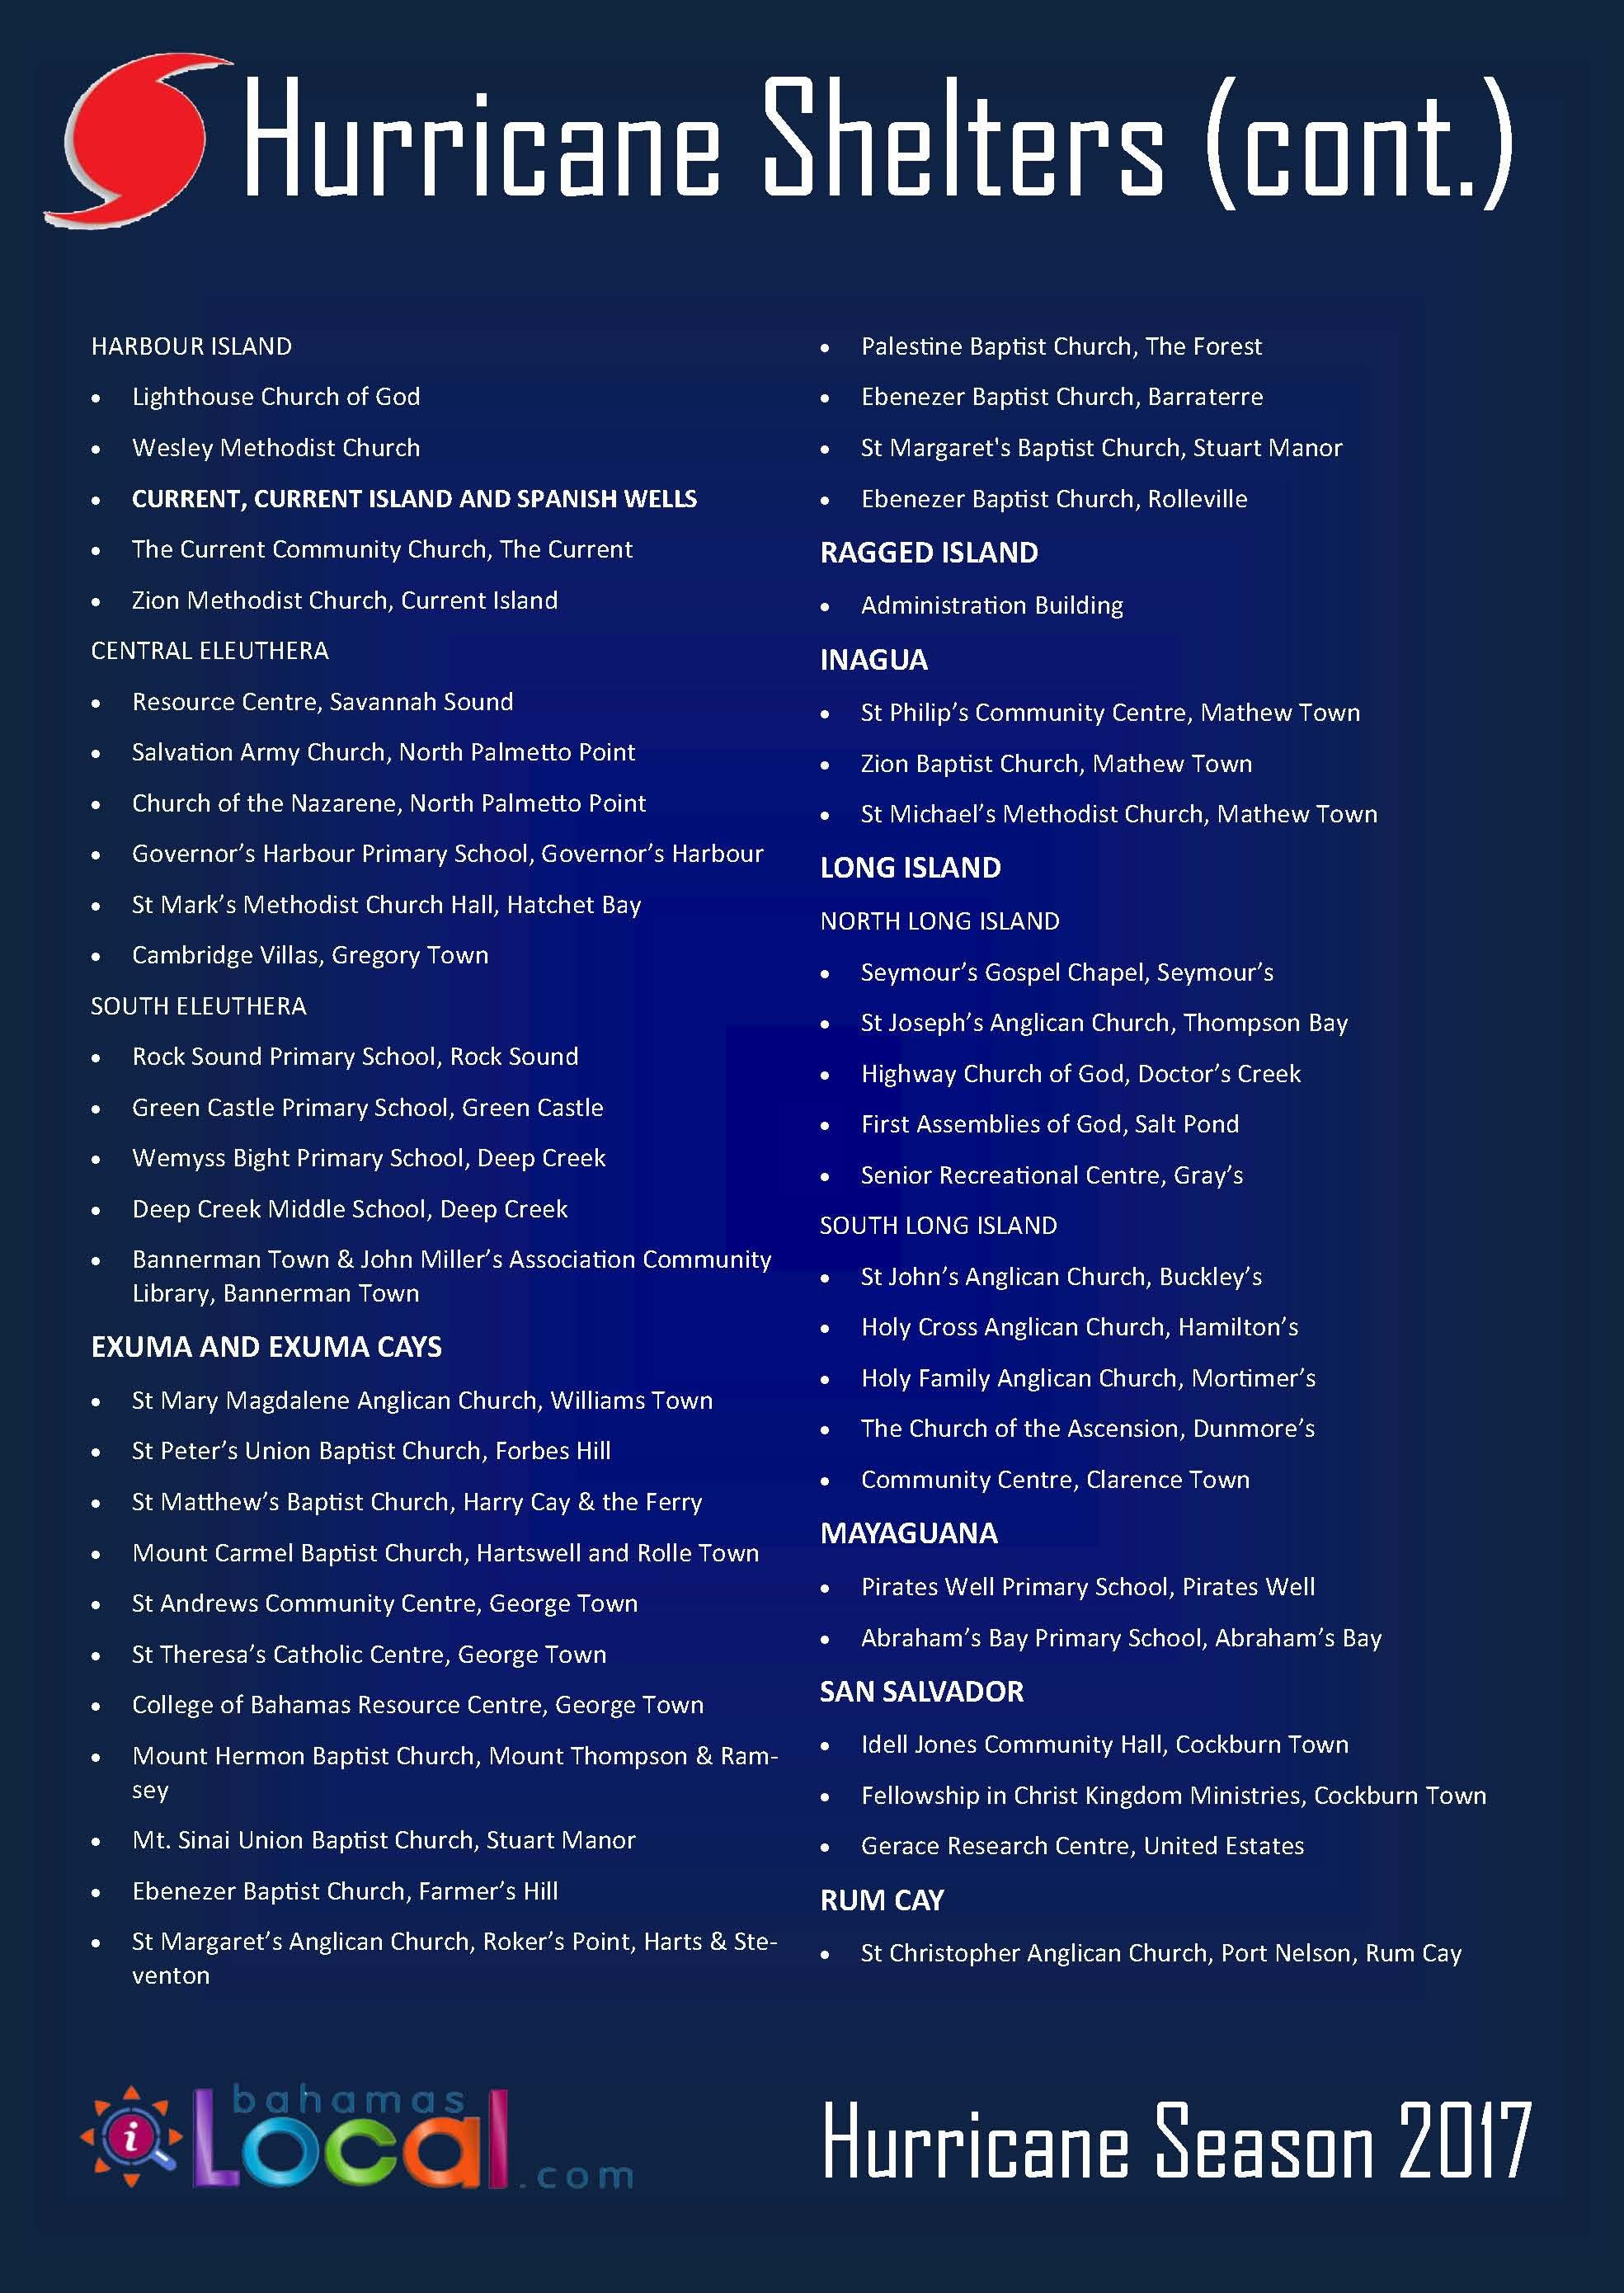 Shelters Page 3 | Hurricane Season 2017